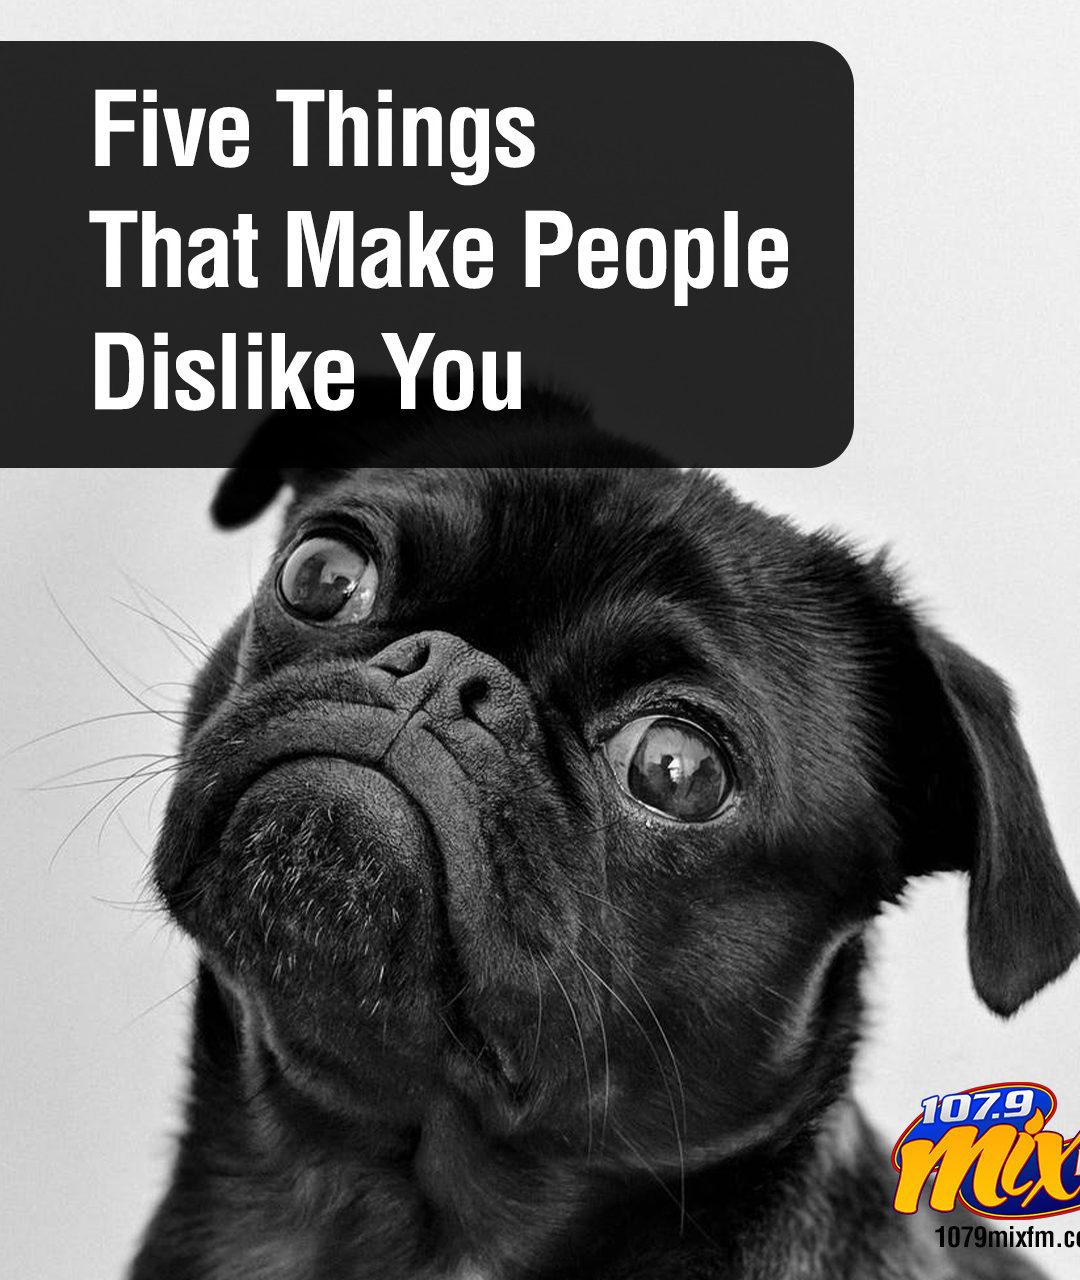 Five Things That Make People Dislike You